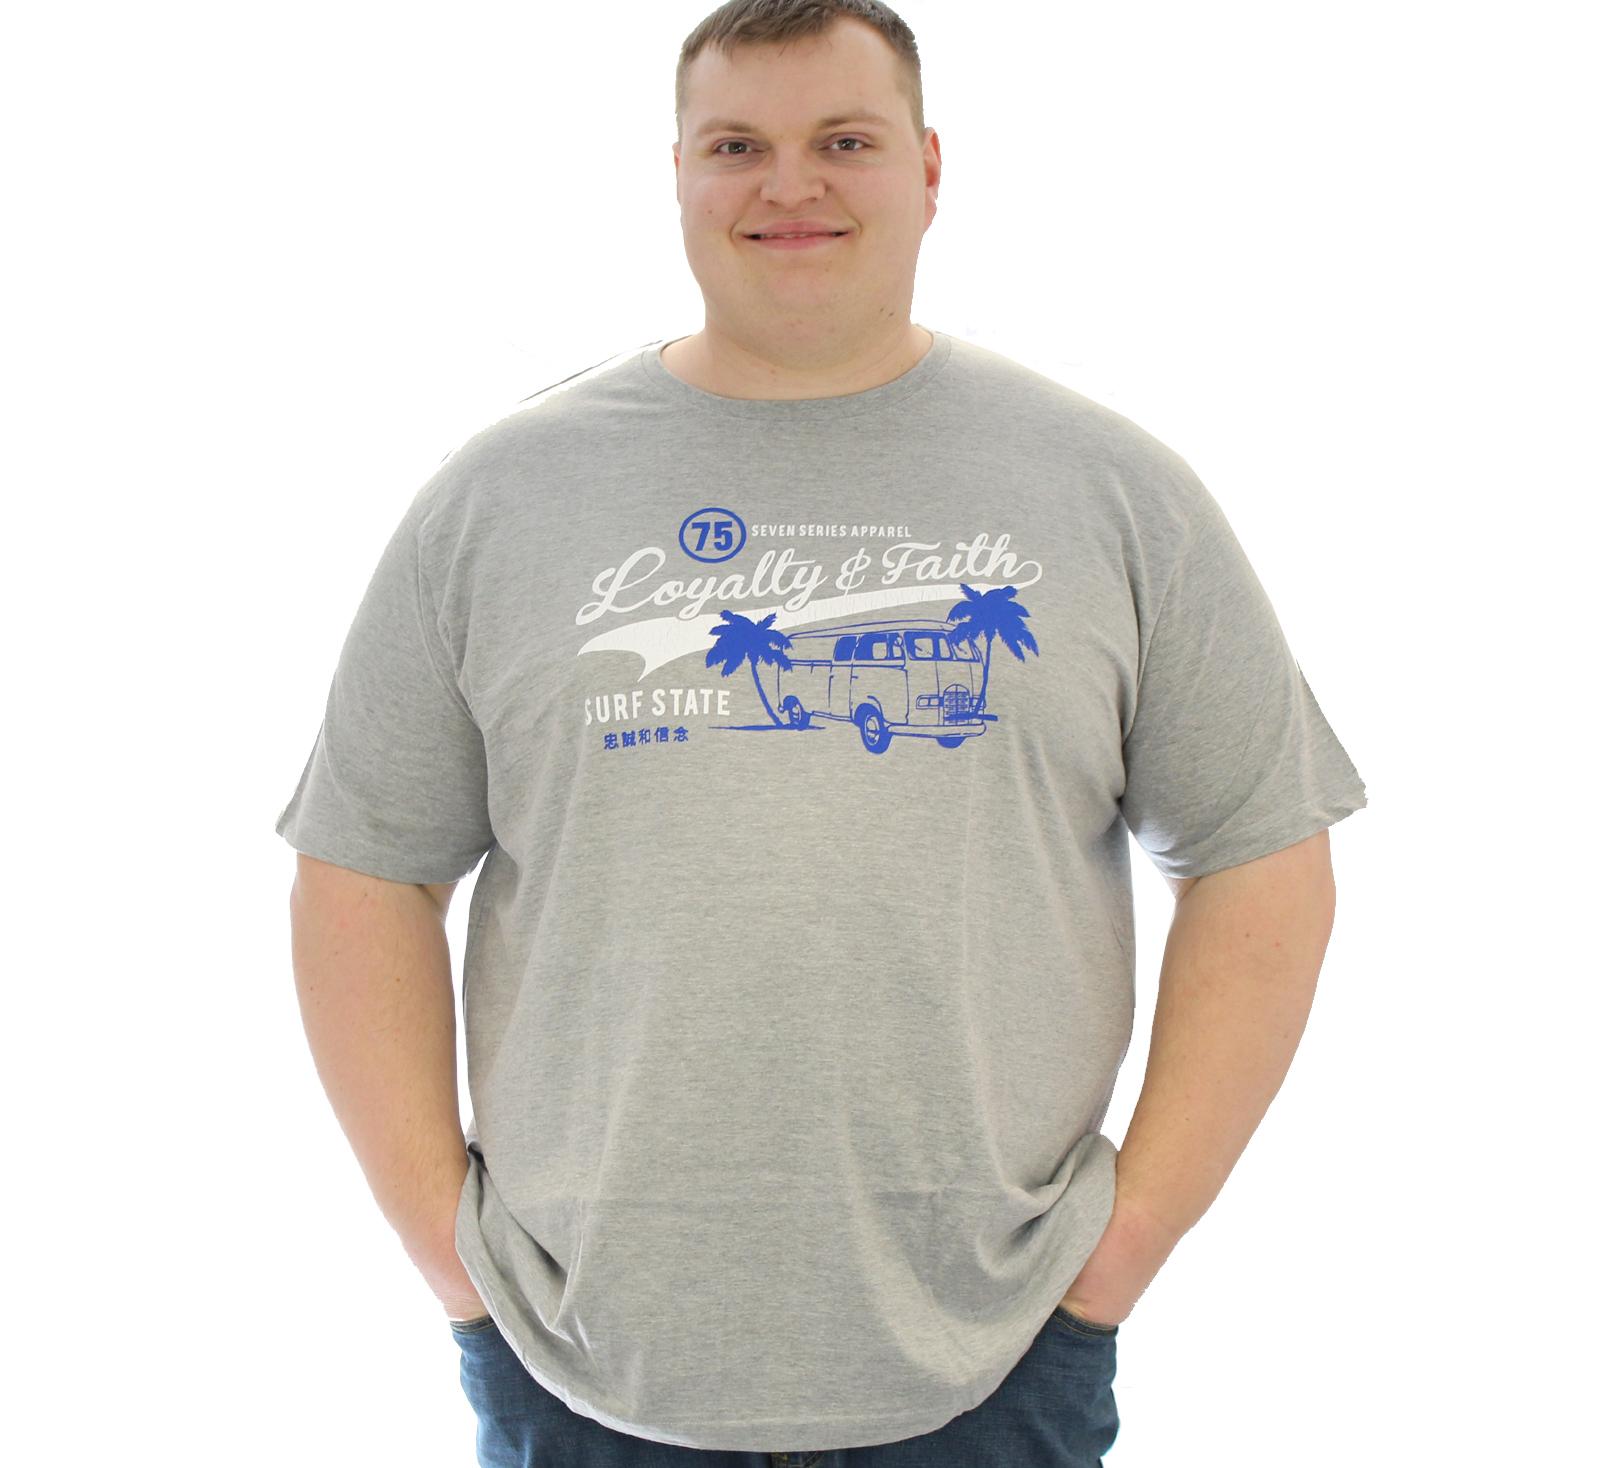 Loyalty & Faith Southport T-Shirt - Grey